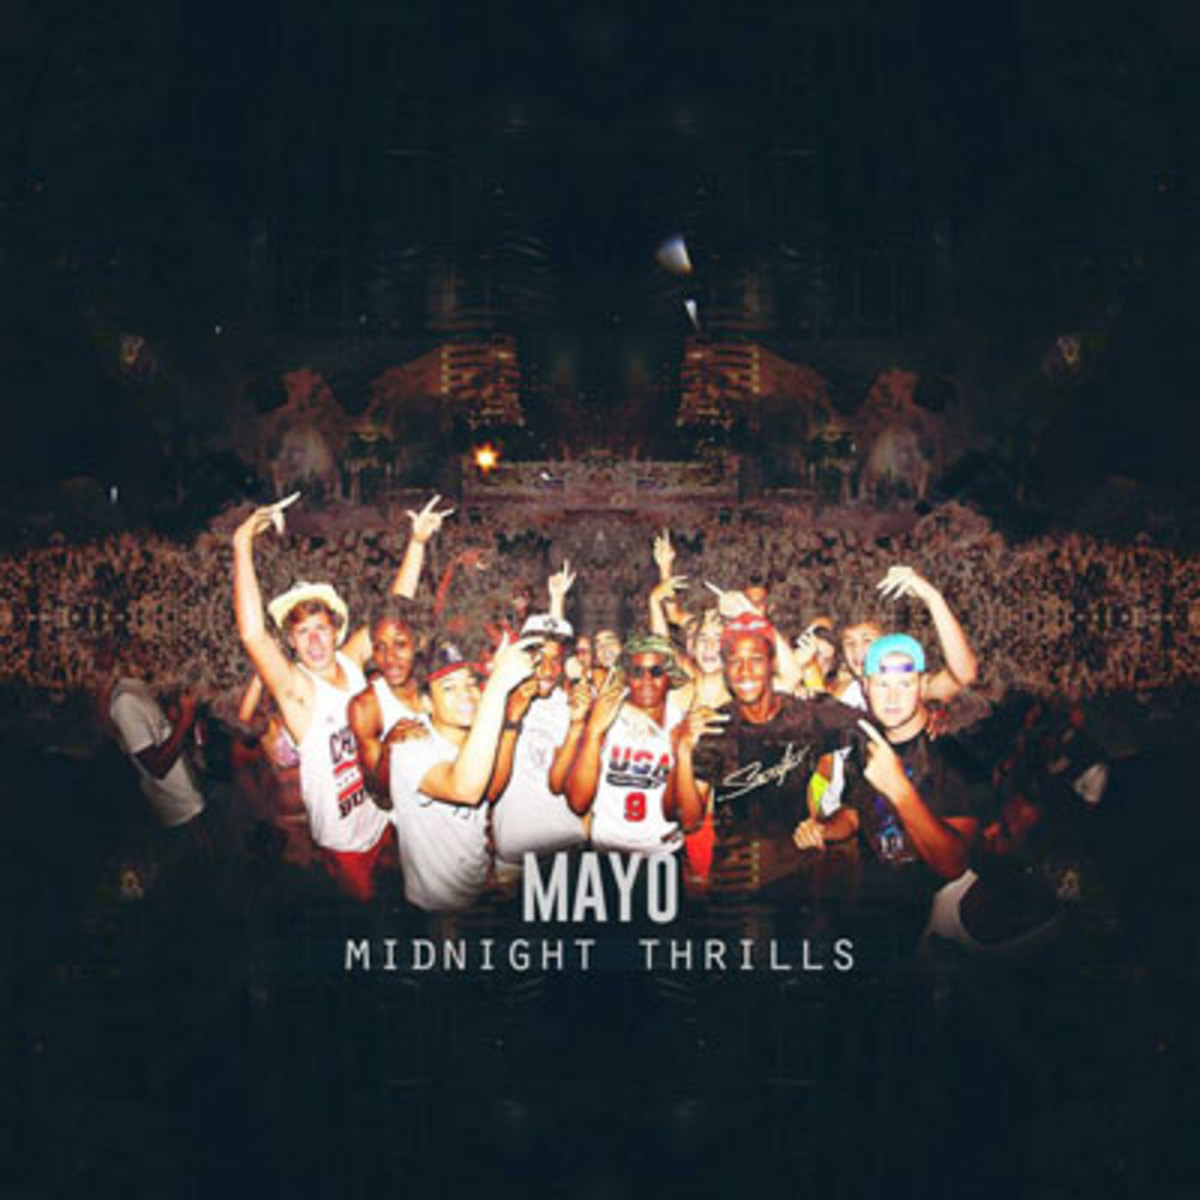 mayo-midnightthrills.jpg